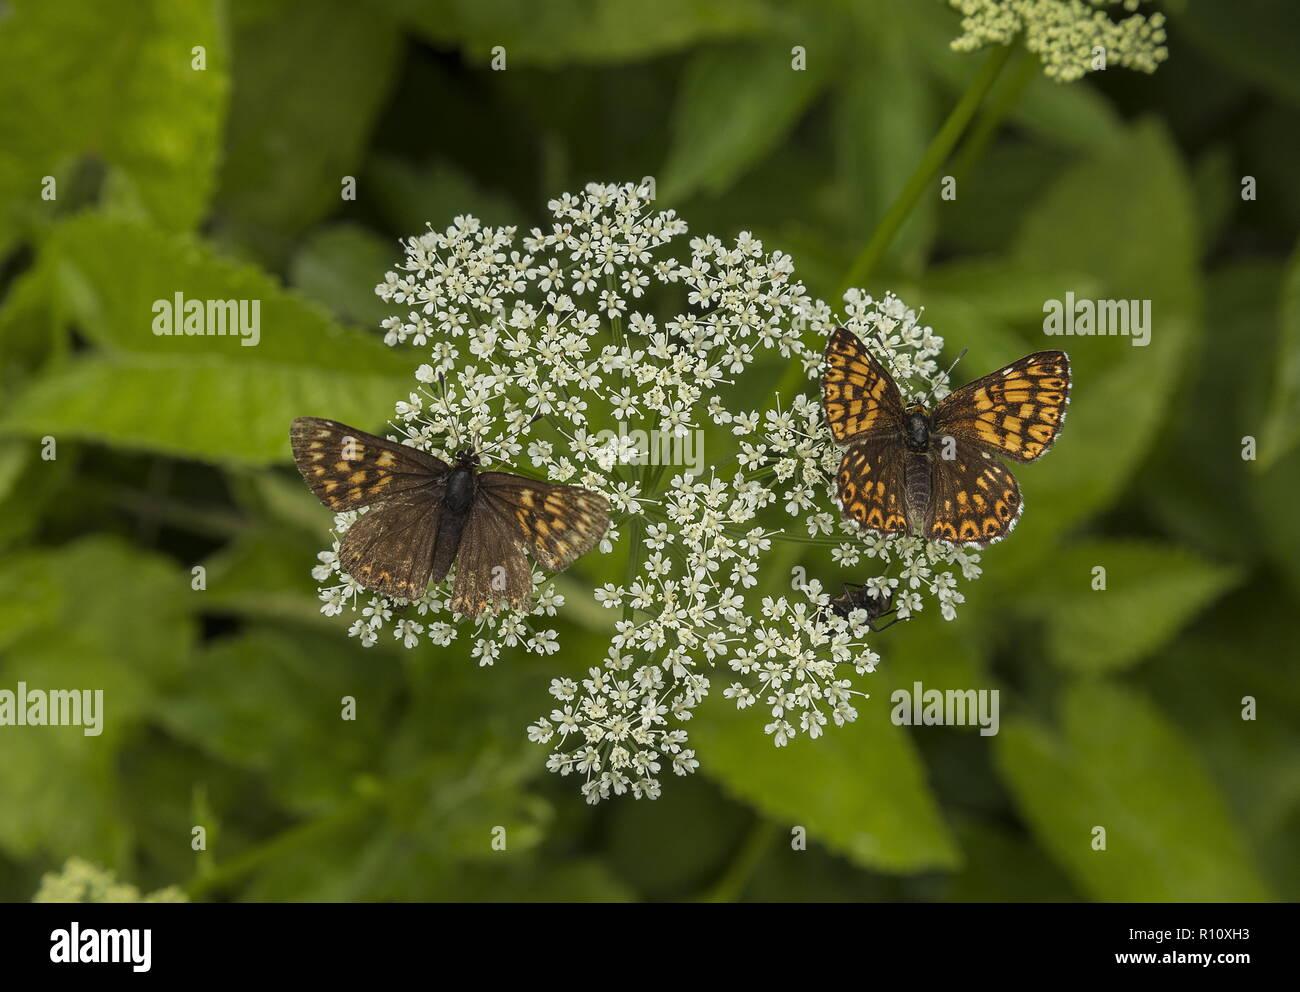 Duke of Burgundy, Hamearis lucina, two butterflies nectaring on Ground Elder flowers. - Stock Image